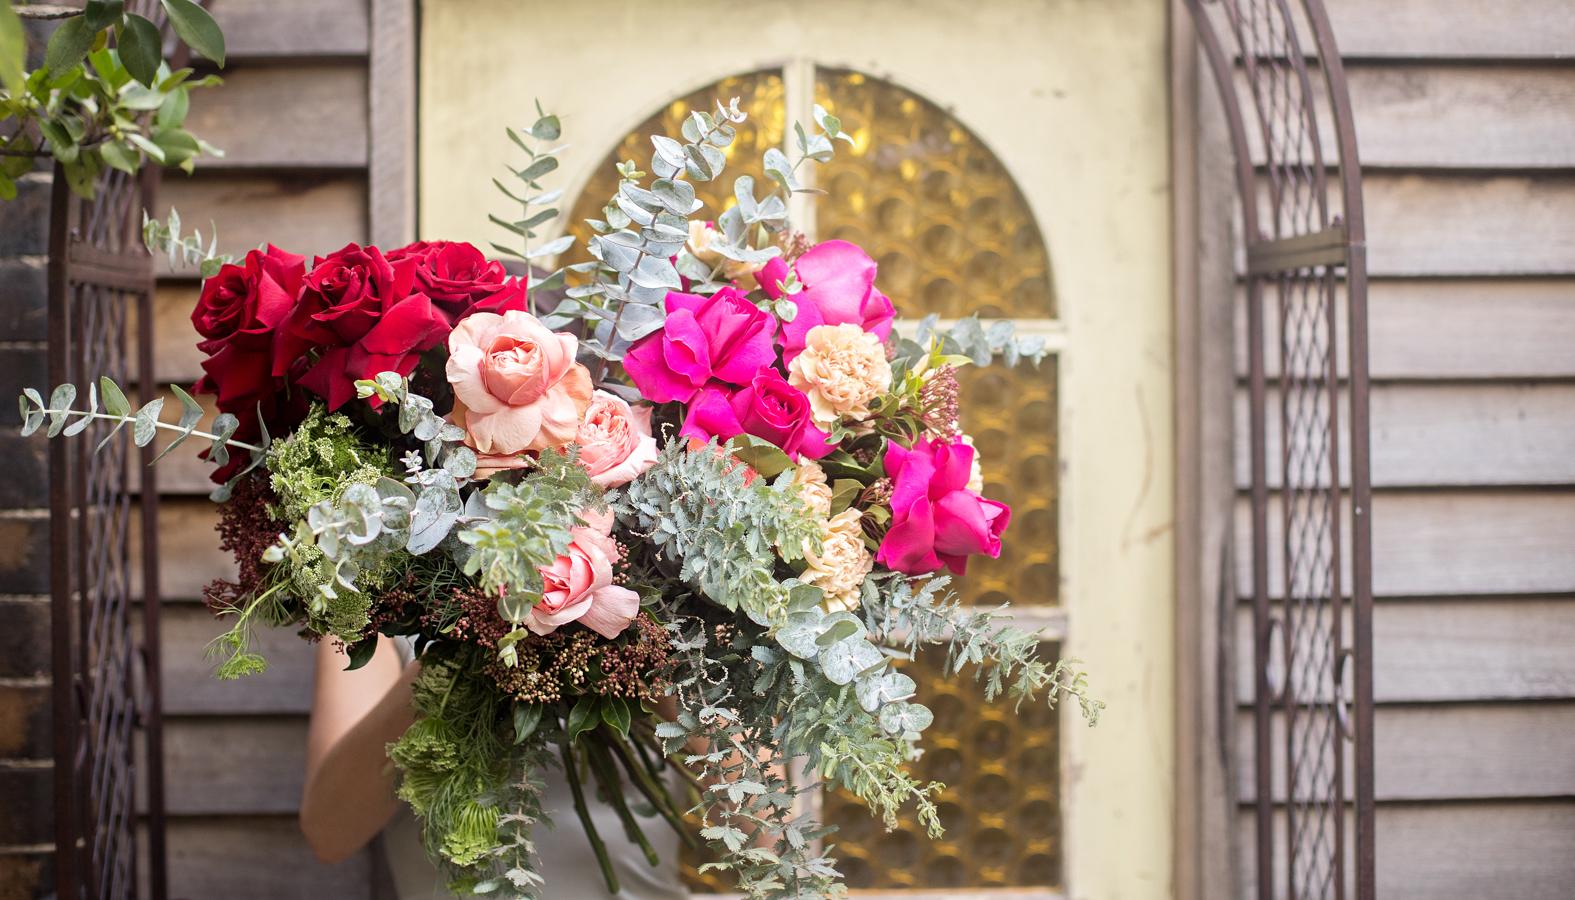 florals-lores-46